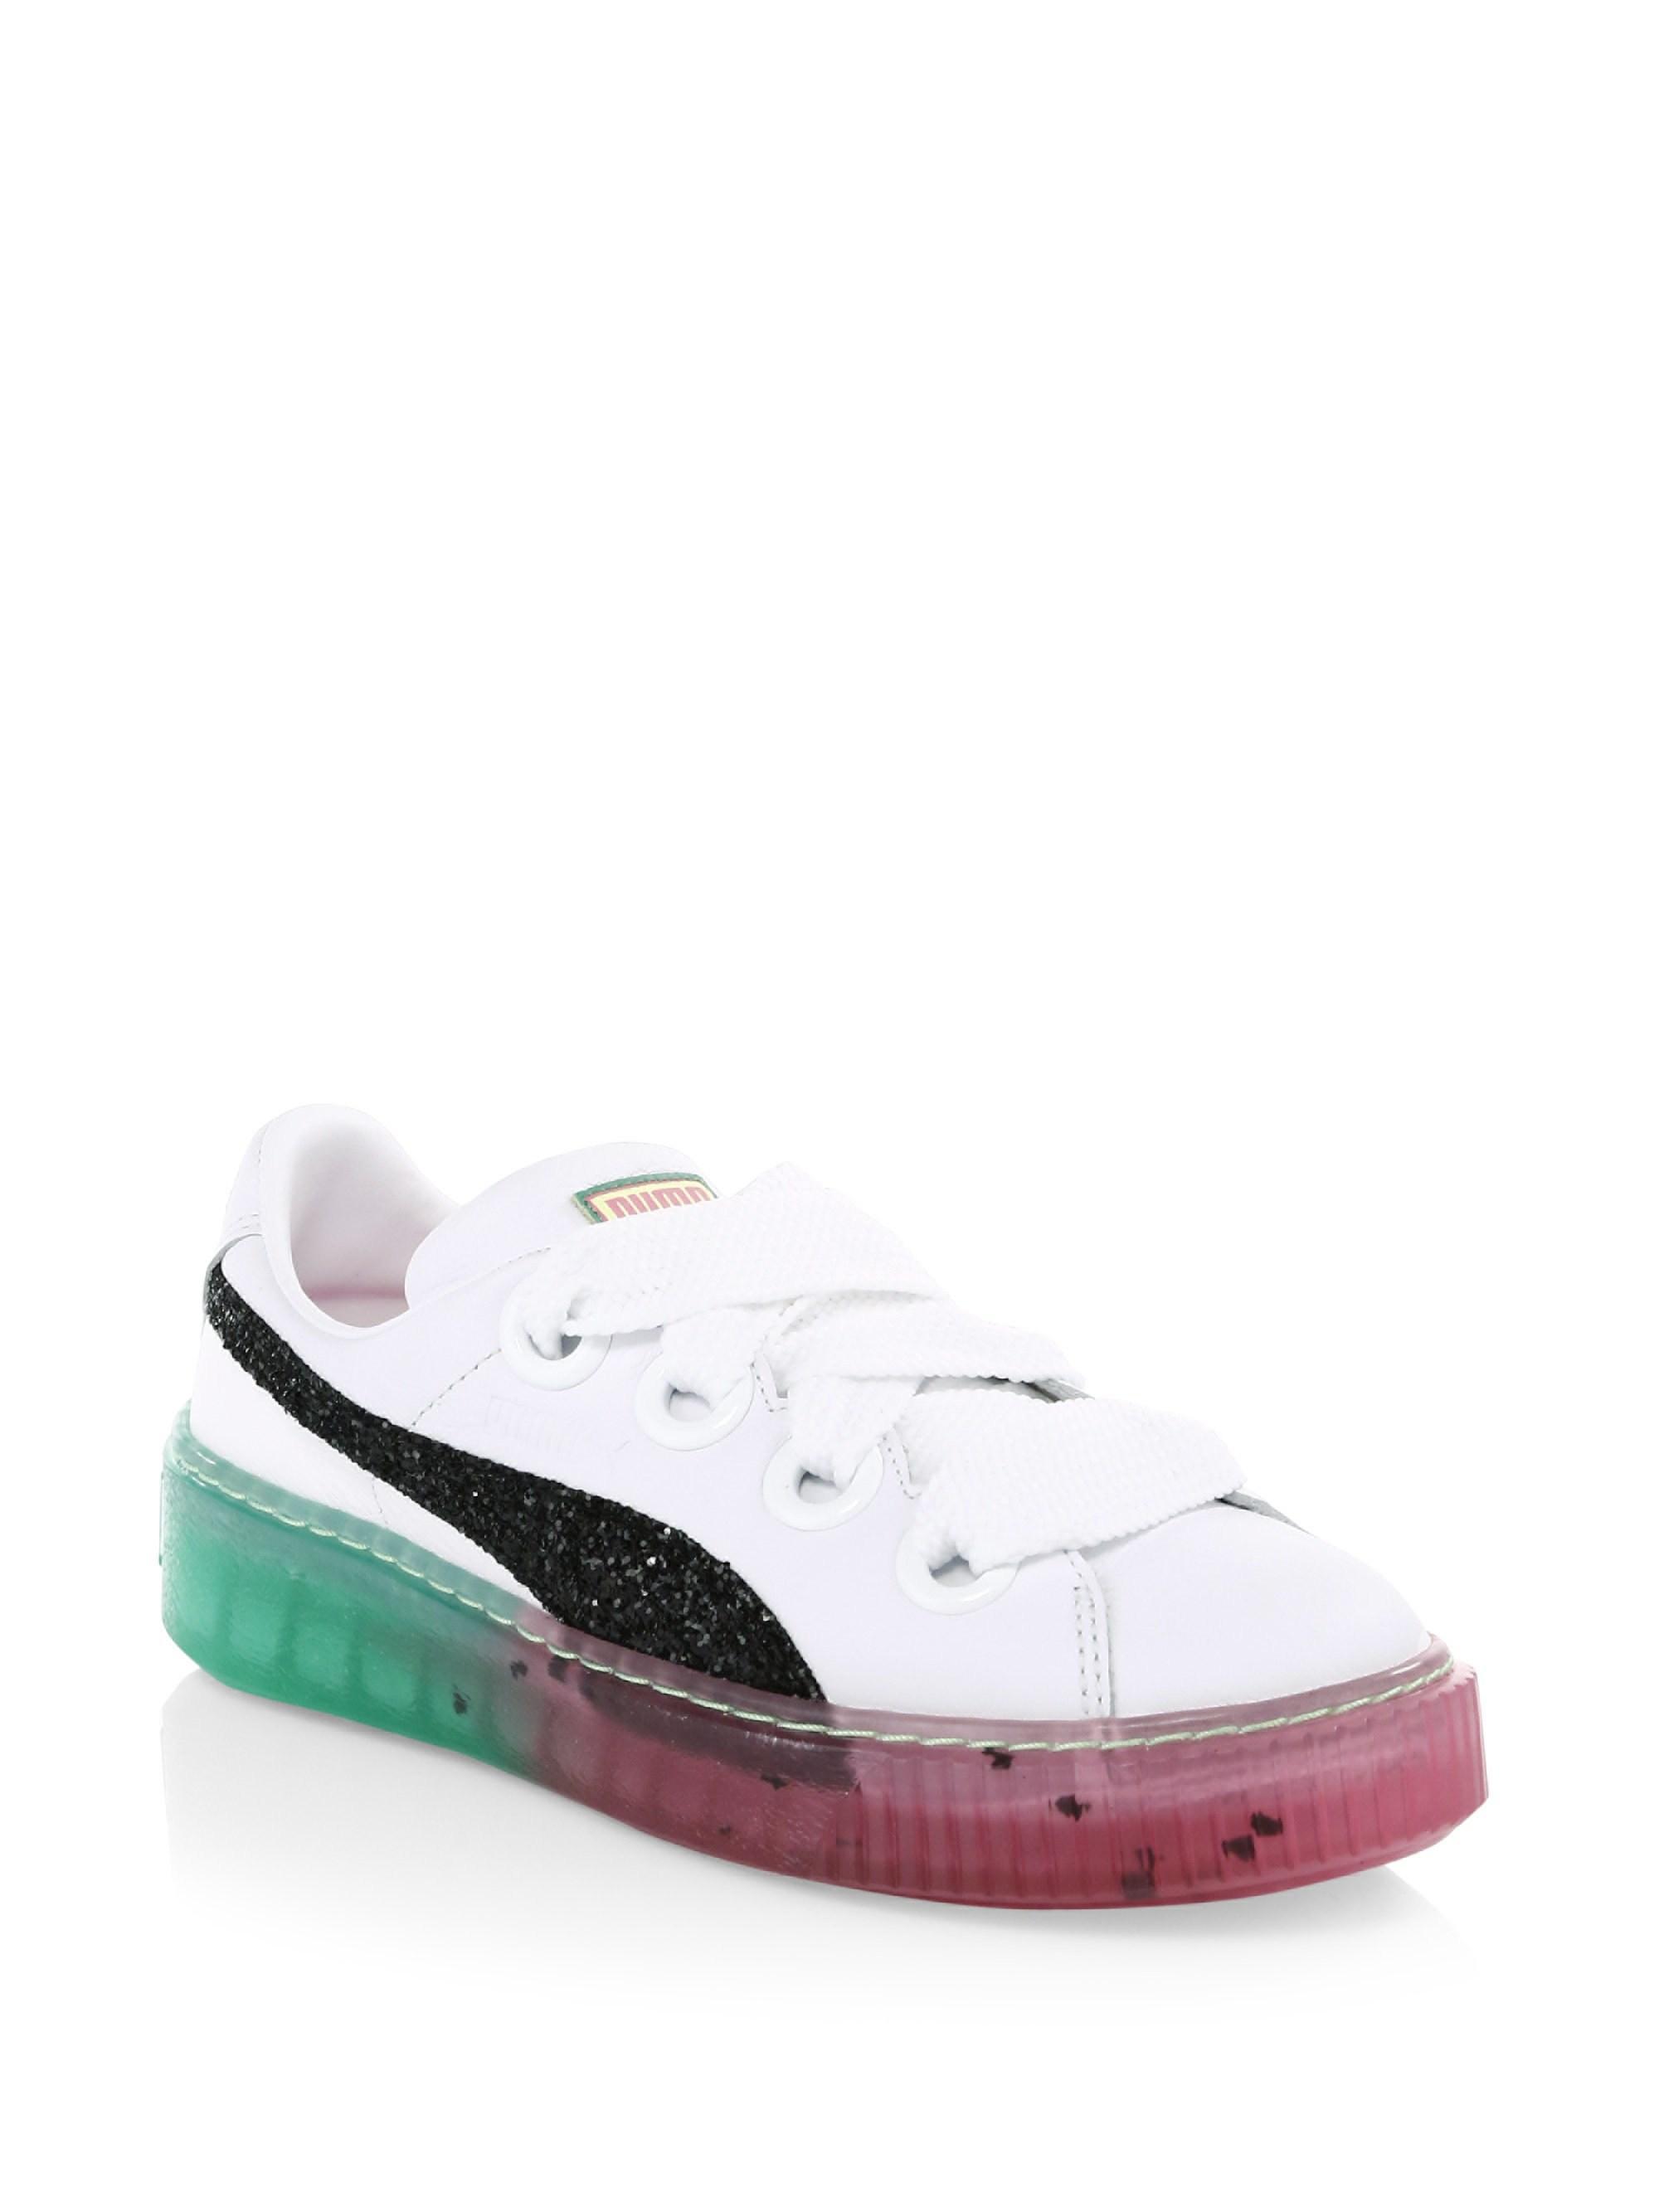 0473b3daec4 PUMA - White Candy Princess Leather Platform Sneakers - Lyst. View  fullscreen